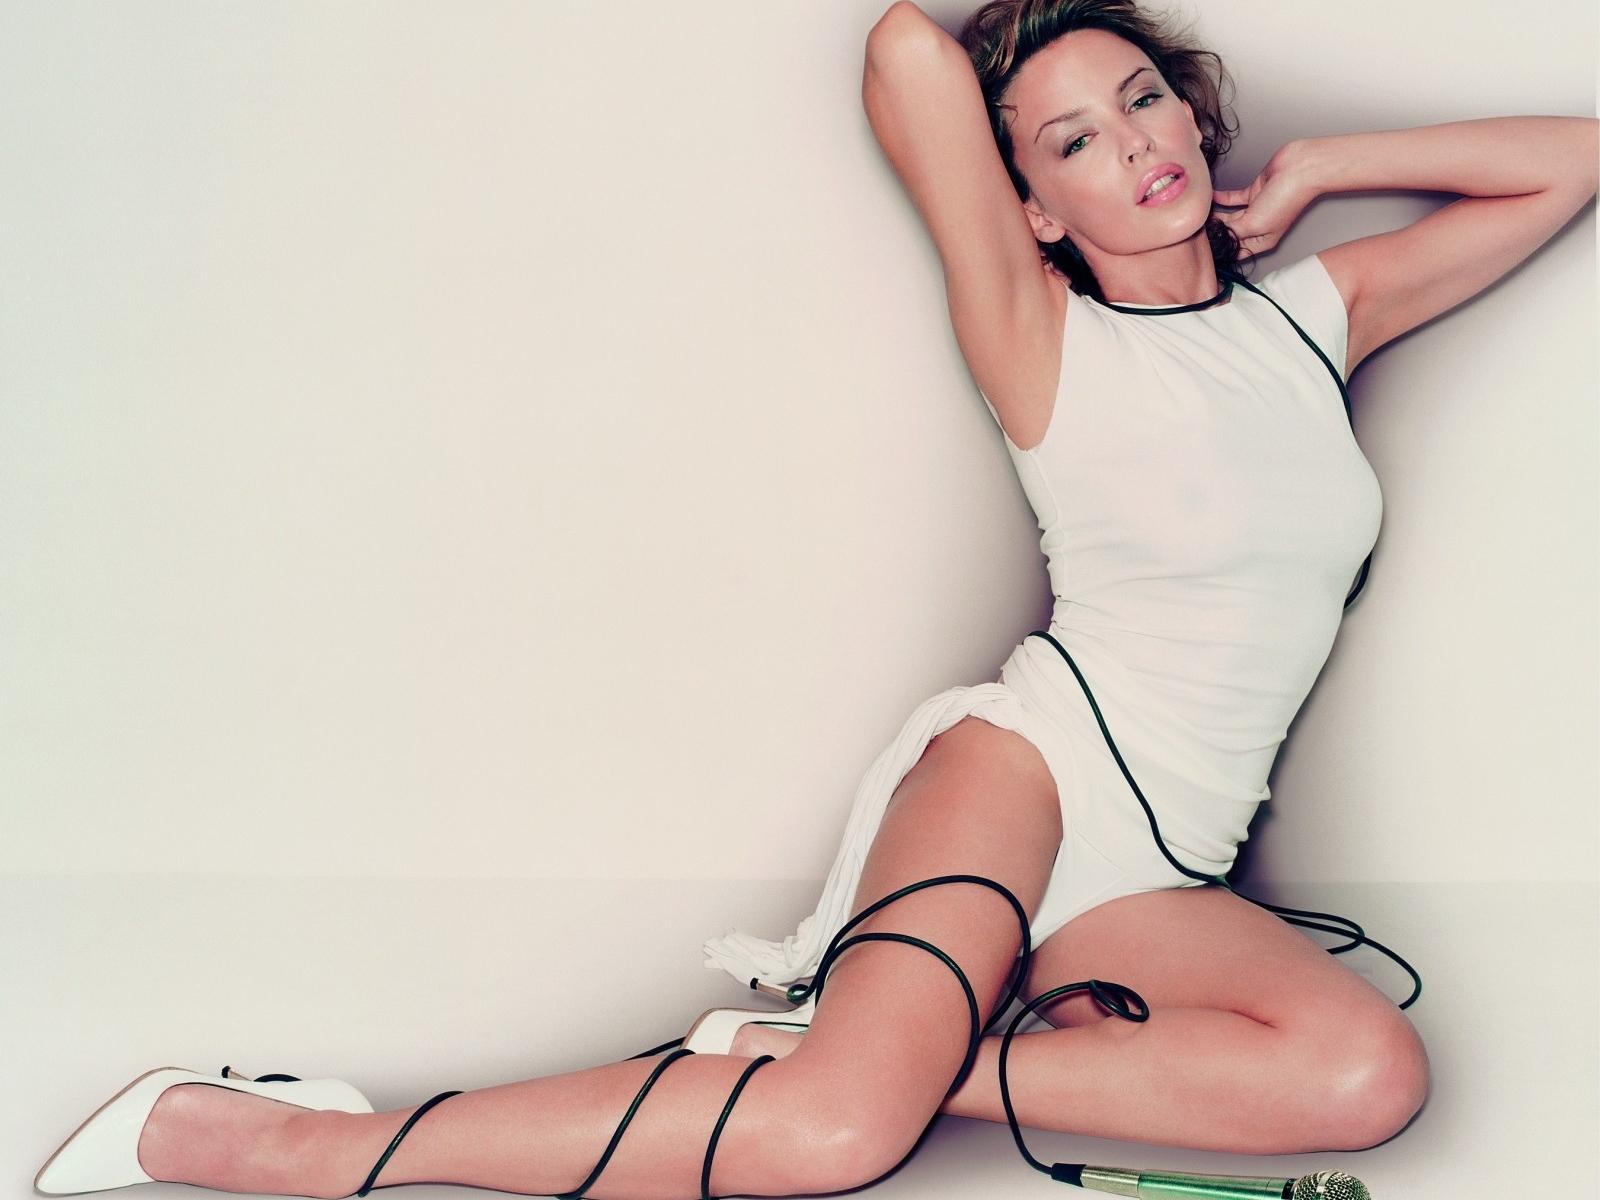 http://1.bp.blogspot.com/-M2O-Kby7Bkg/T8YNuHKNy6I/AAAAAAAAAN8/RWLyll6WLMk/s1600/Kylie-Minogue-Singer.jpg